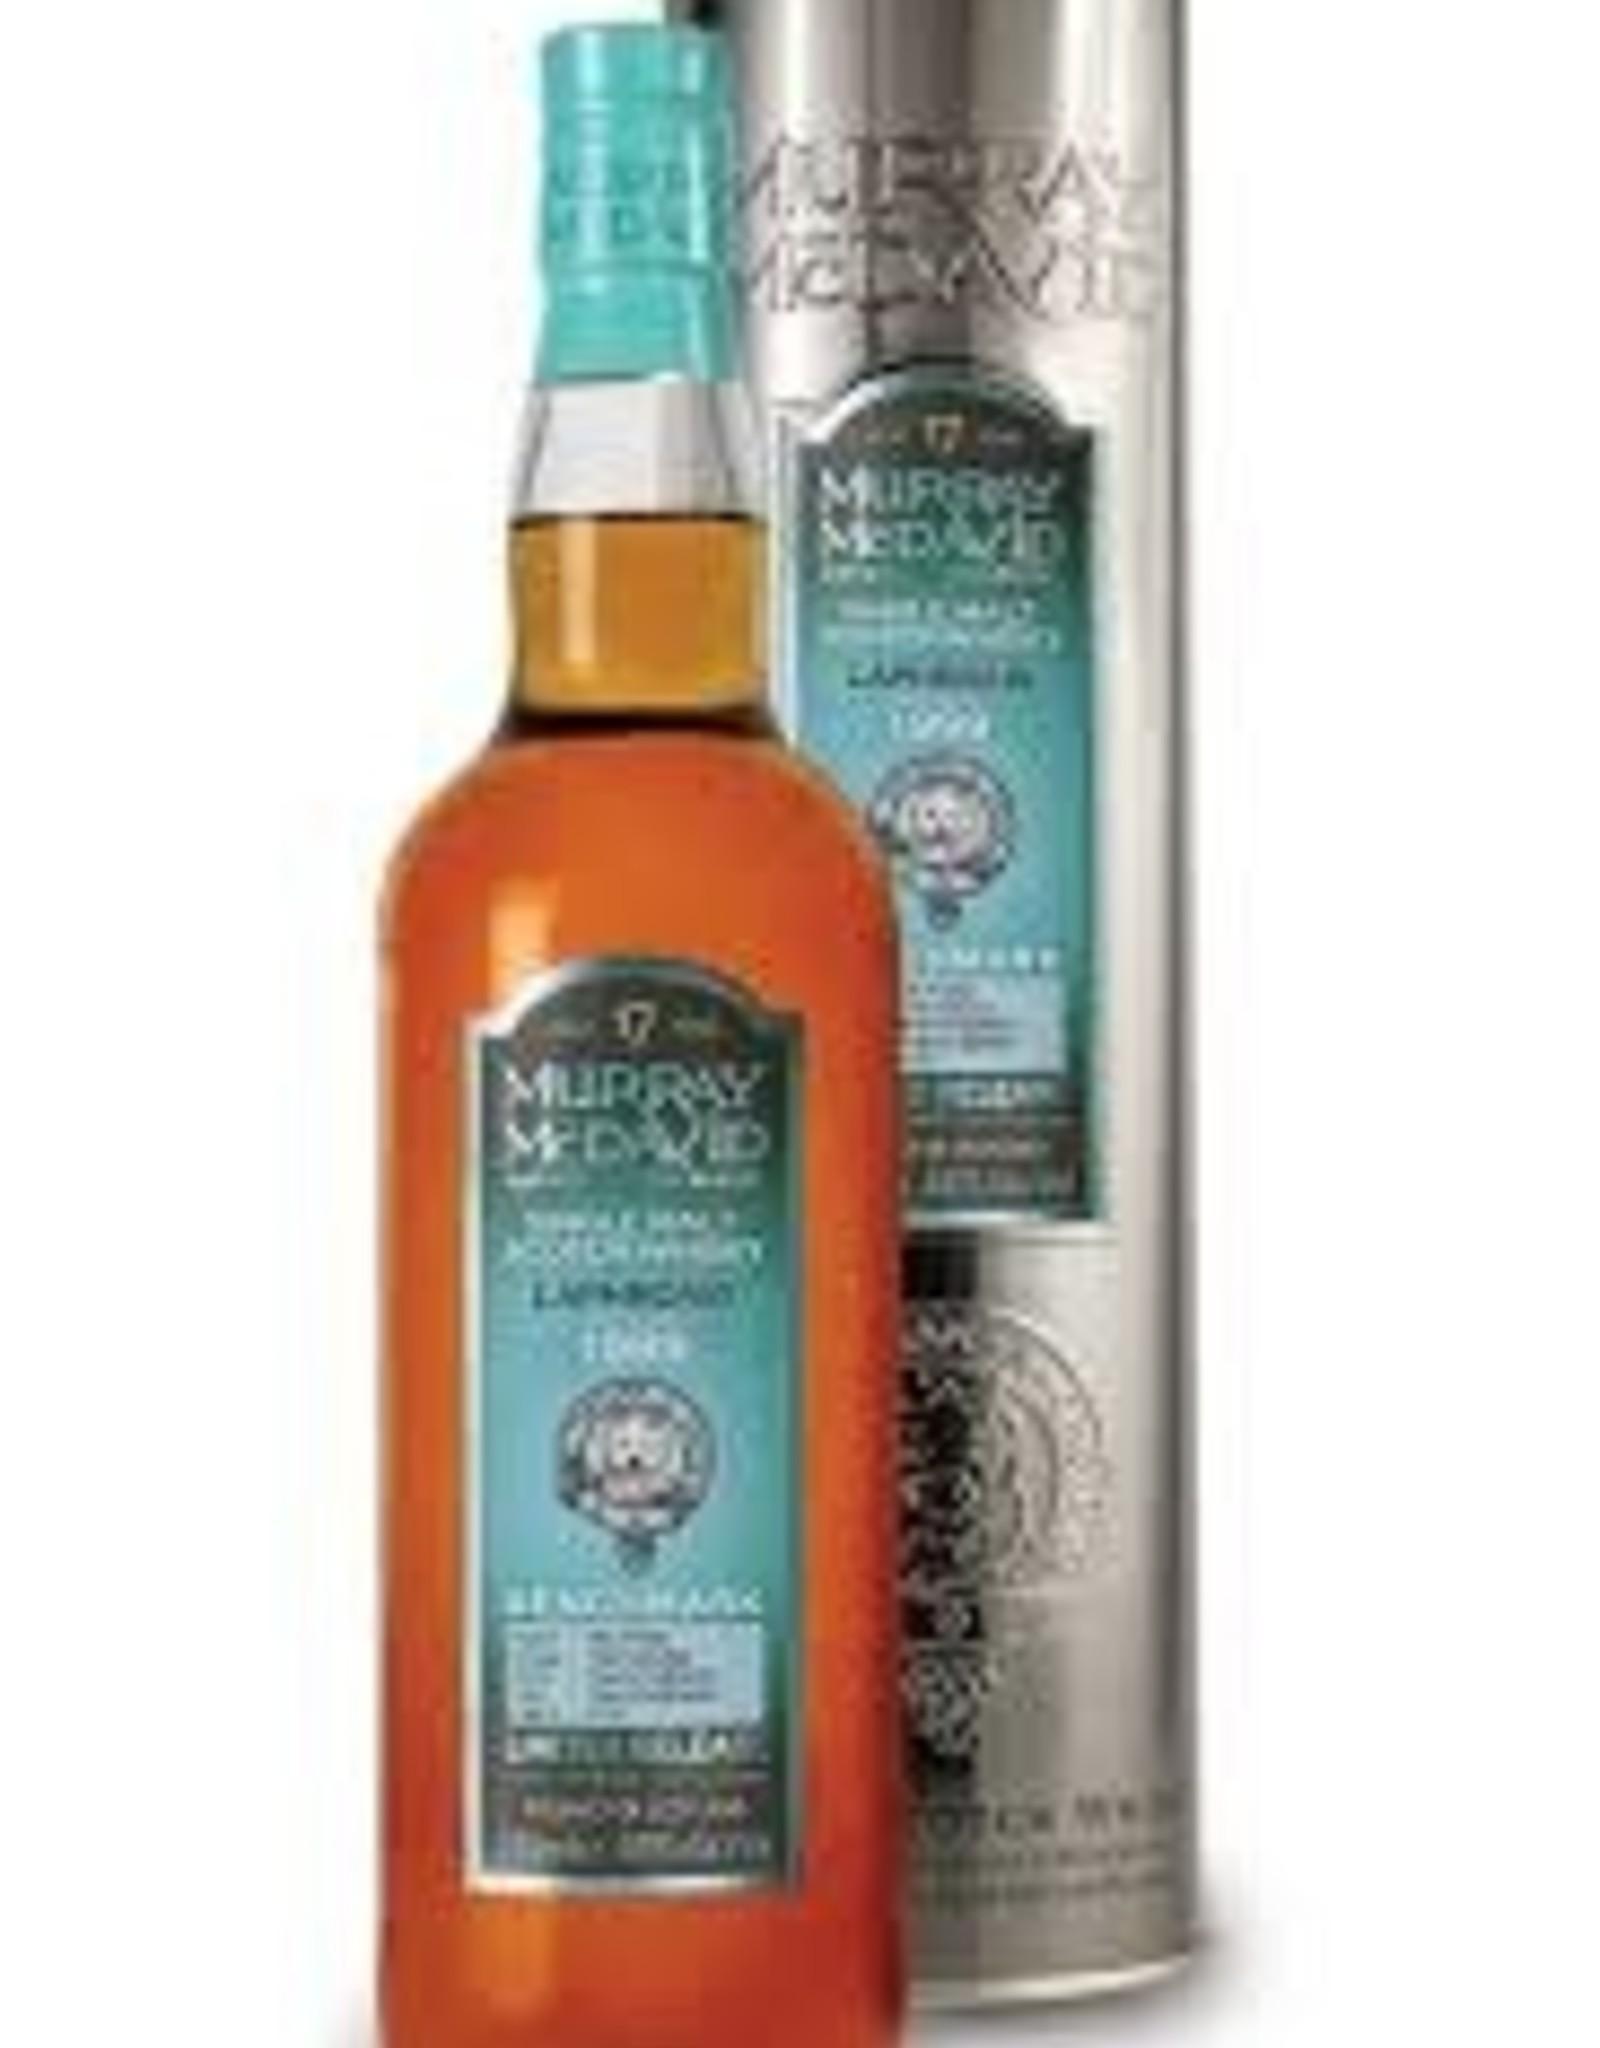 Single Malt Whisky, Islay, Murray McDavid Laphroaig 1999 (17yr.), Glass Revolution